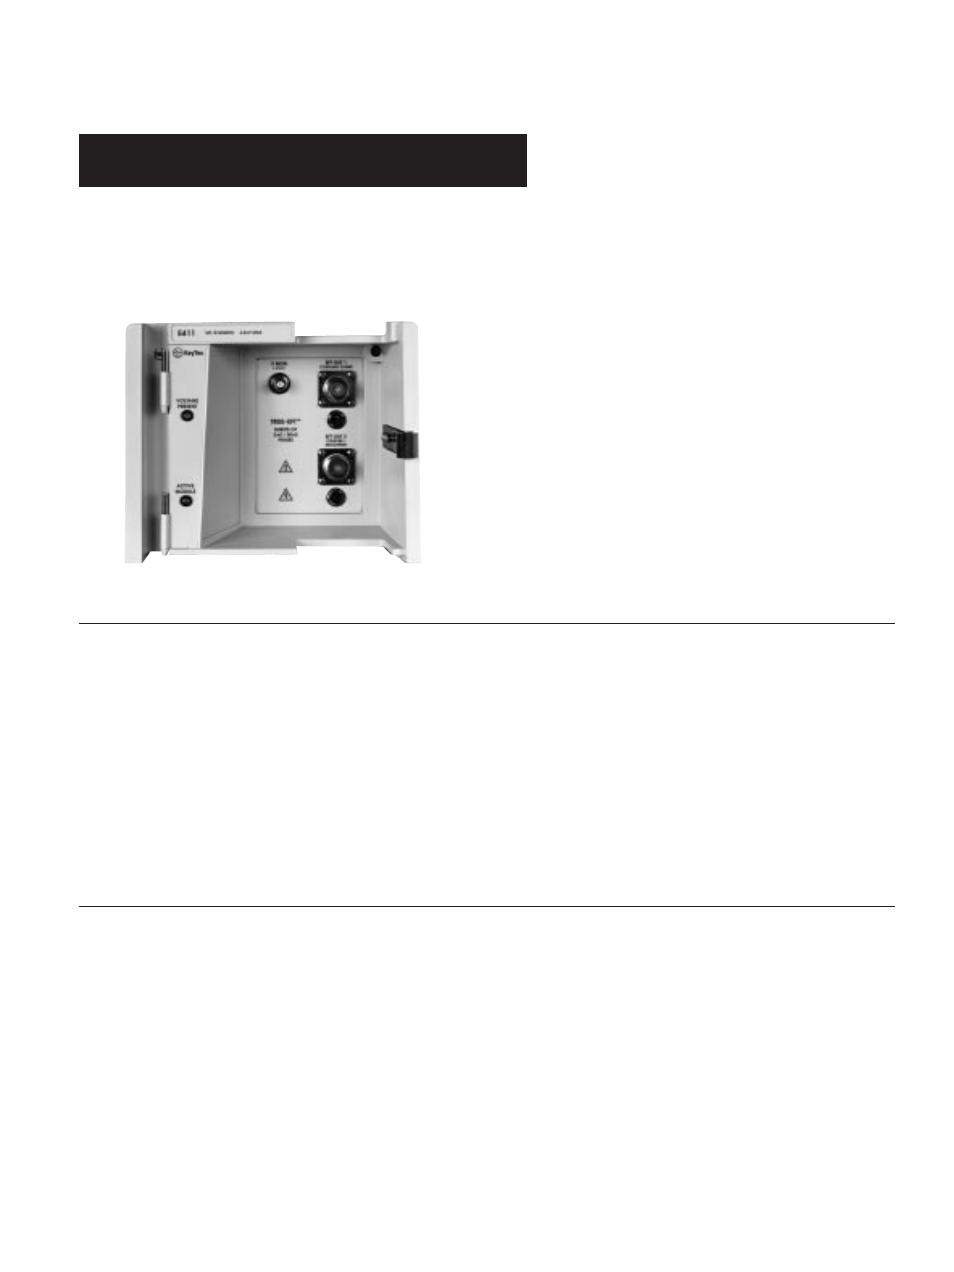 Atec Thermo Scientific-E411 User Manual | 2 pages